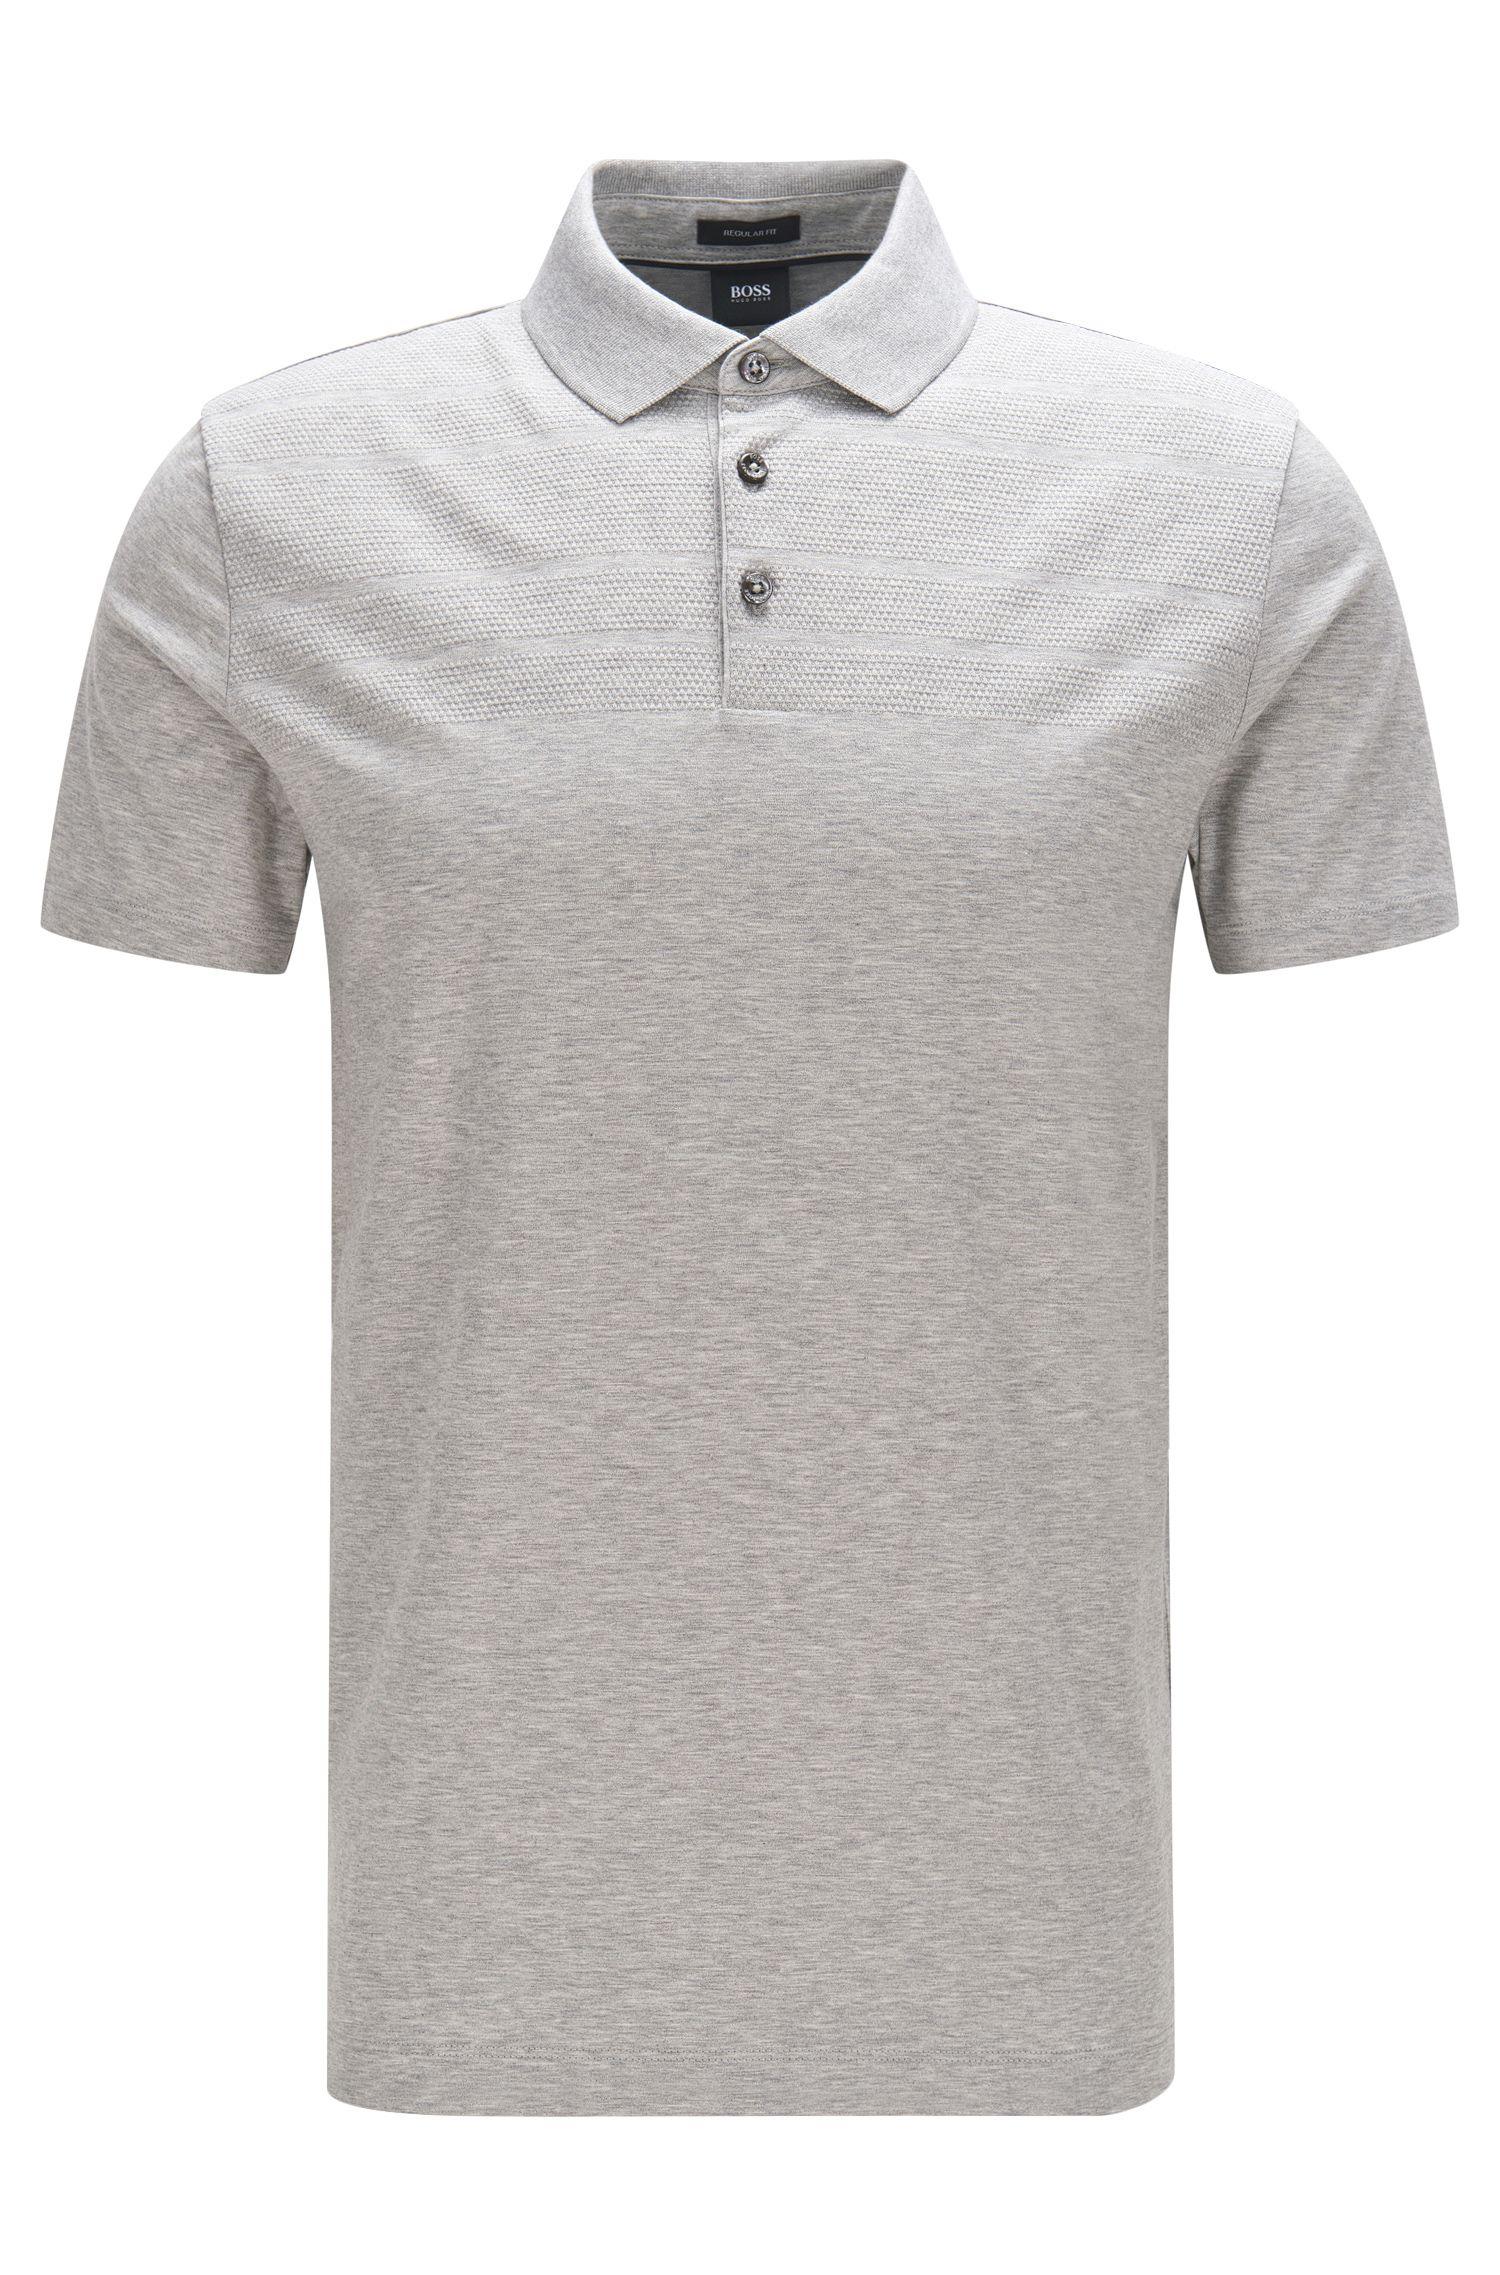 Meliertes Regular-Fit Poloshirt aus Baumwolle: 'Pack 07'